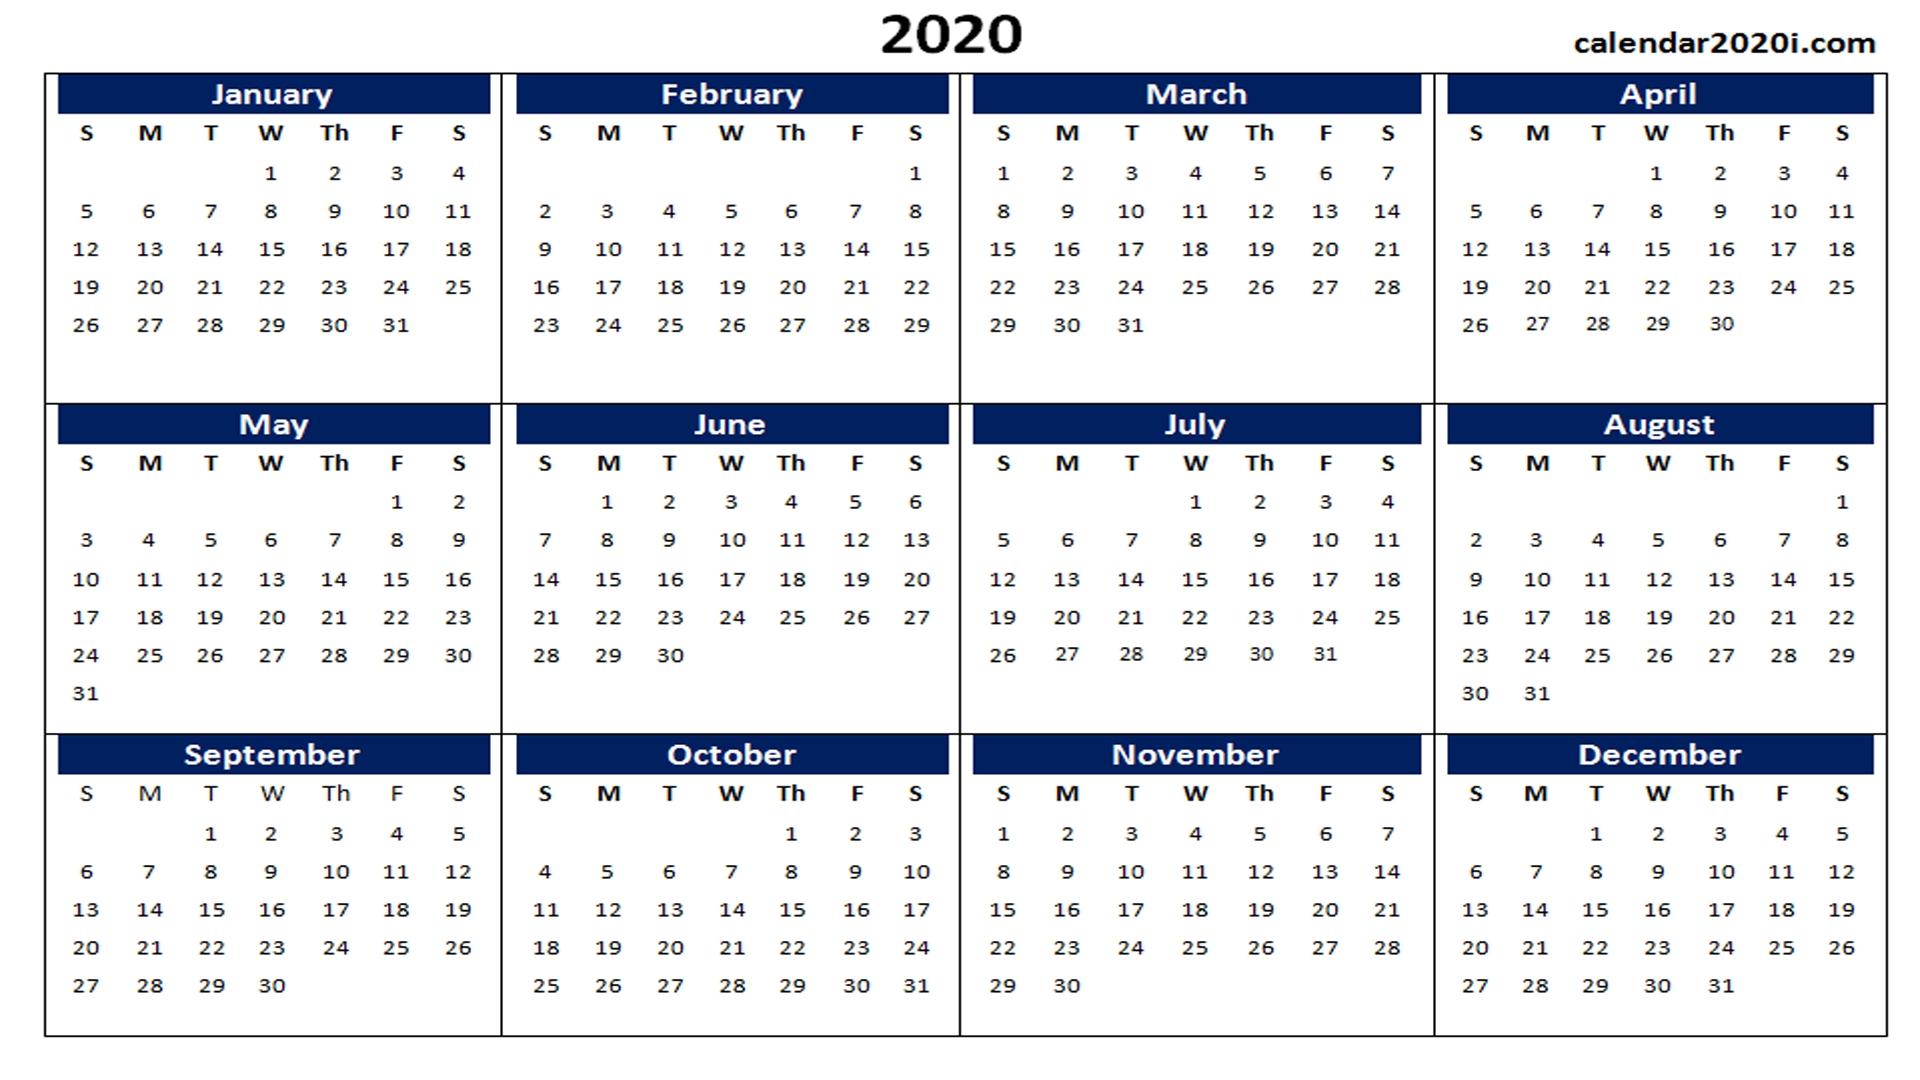 Blank 2020 Calendar Printable Templates | Calendar 2020 intended for Google 2020 Calendar Template Editable